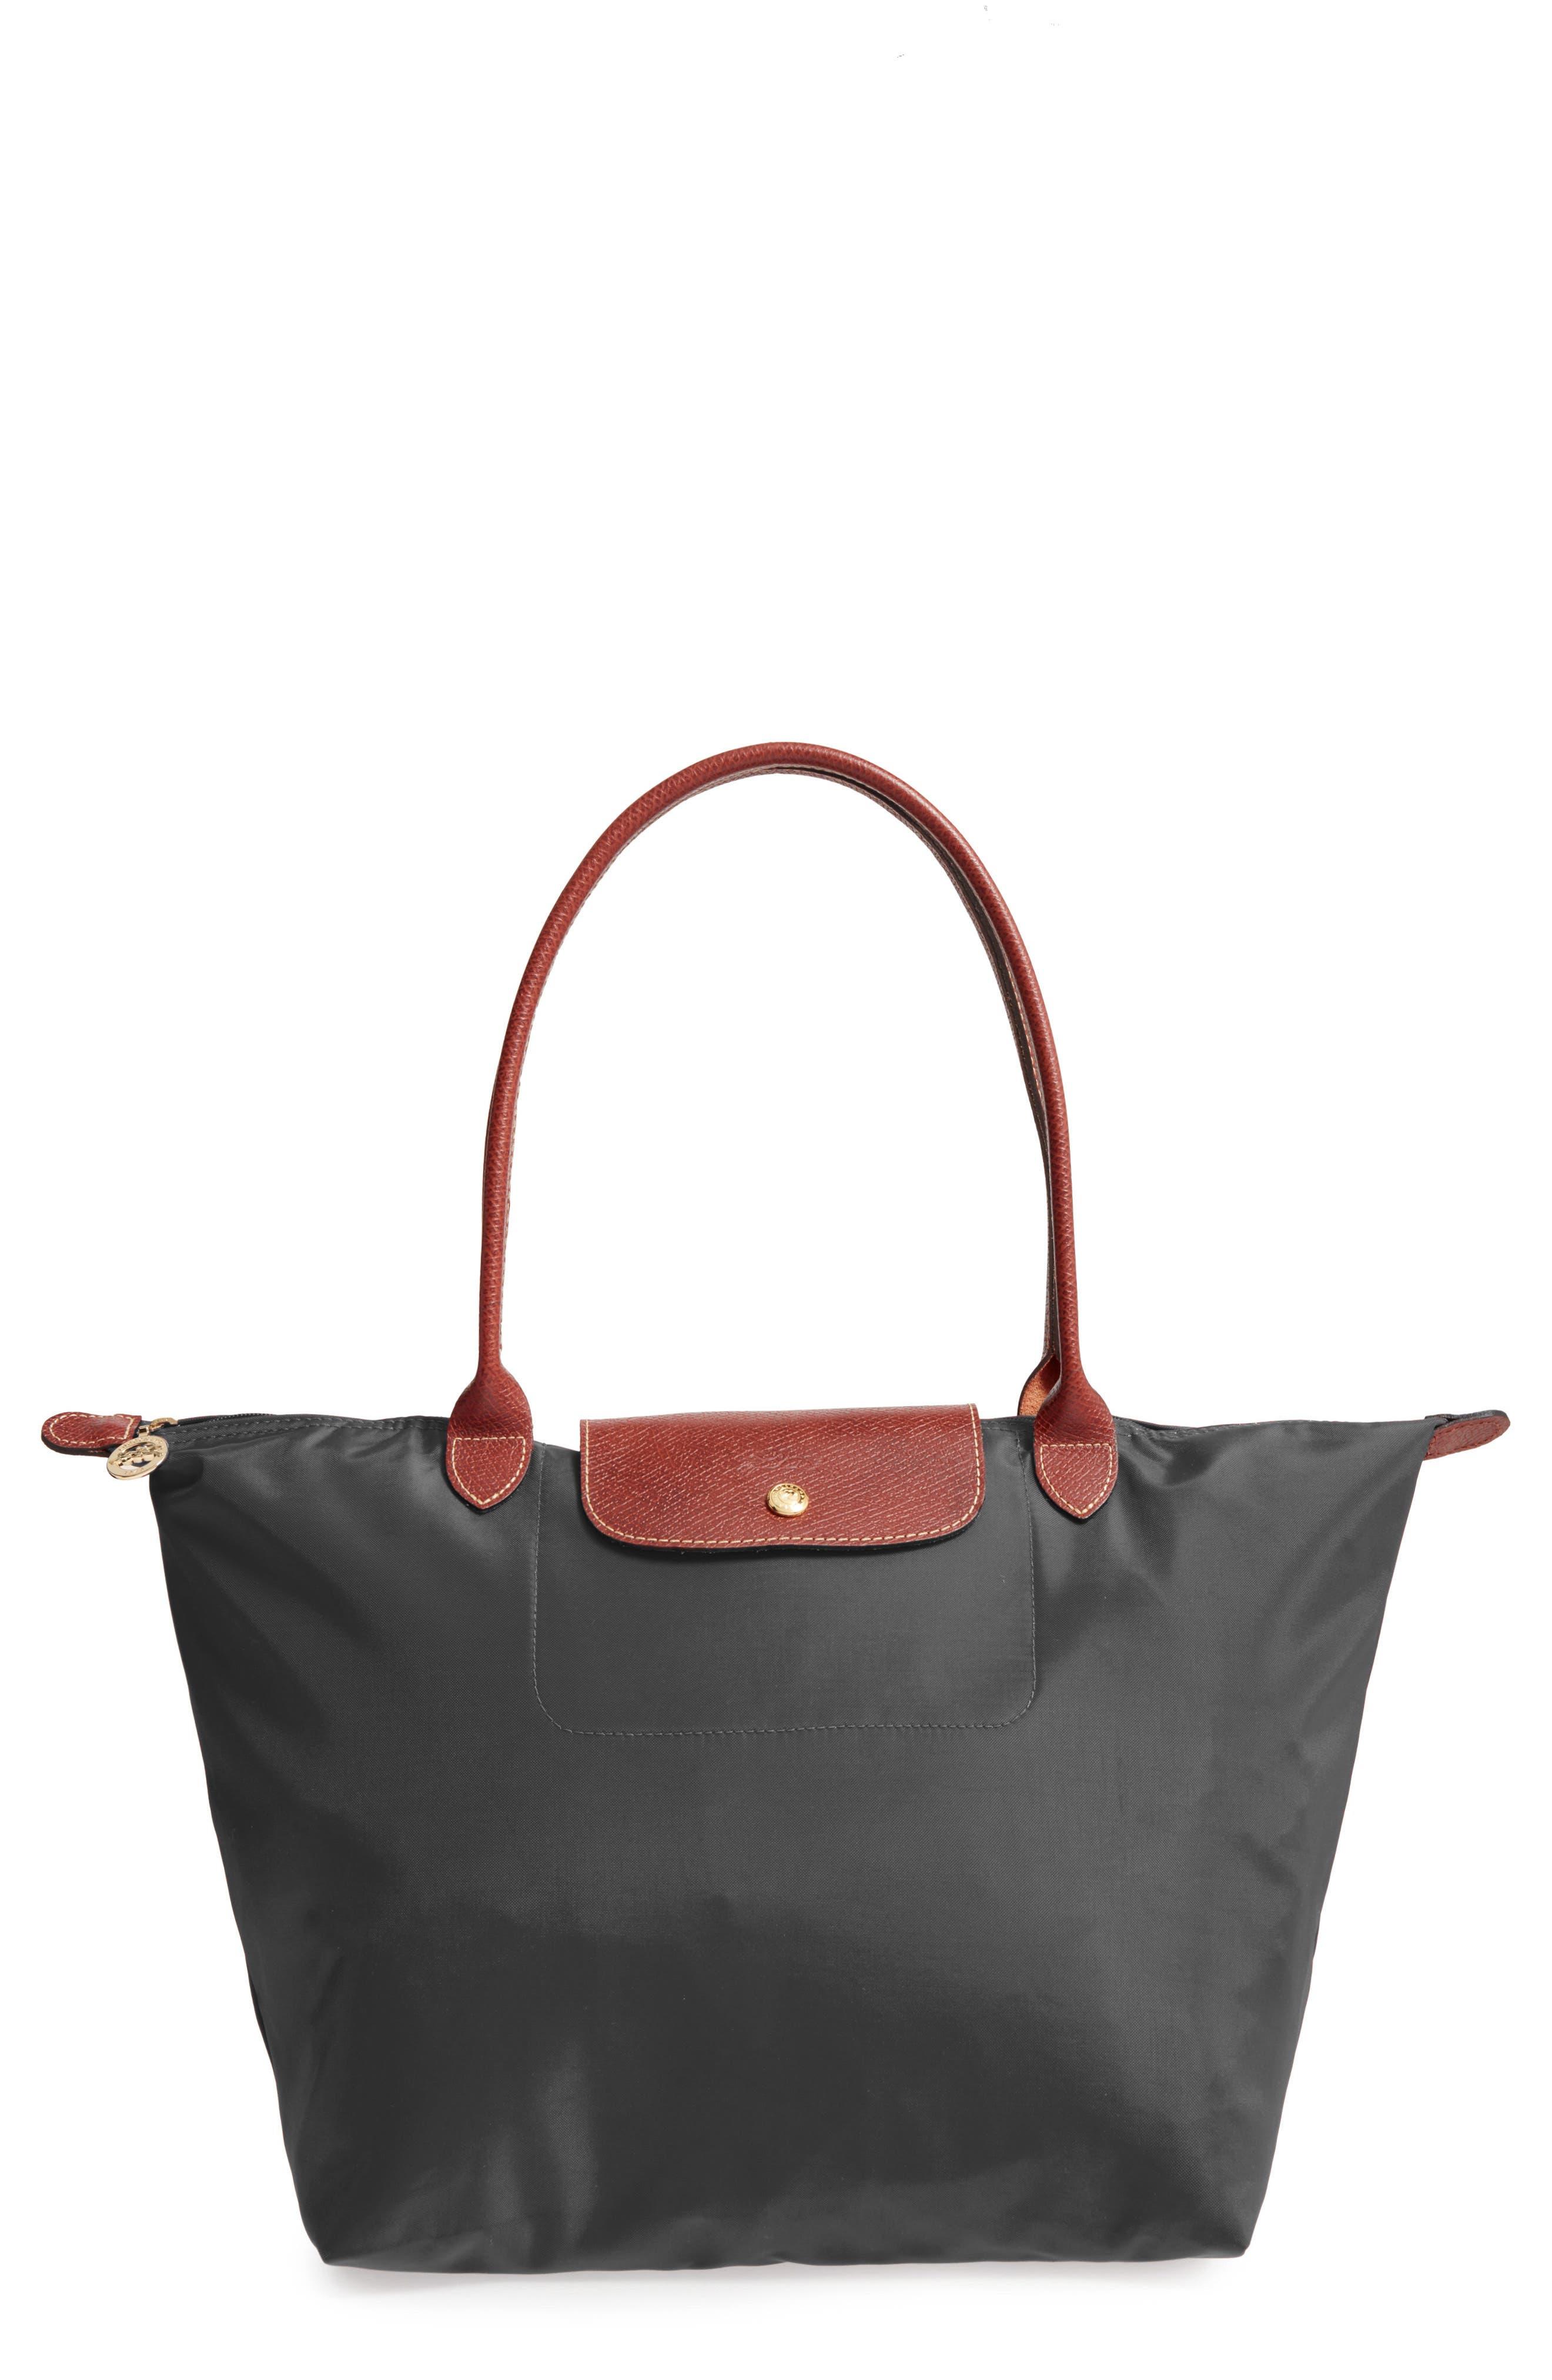 253b27d1209 UPC 671194231473 product image for Longchamp 'Large Le Pliage' Tote  Gunmetal One Size ...